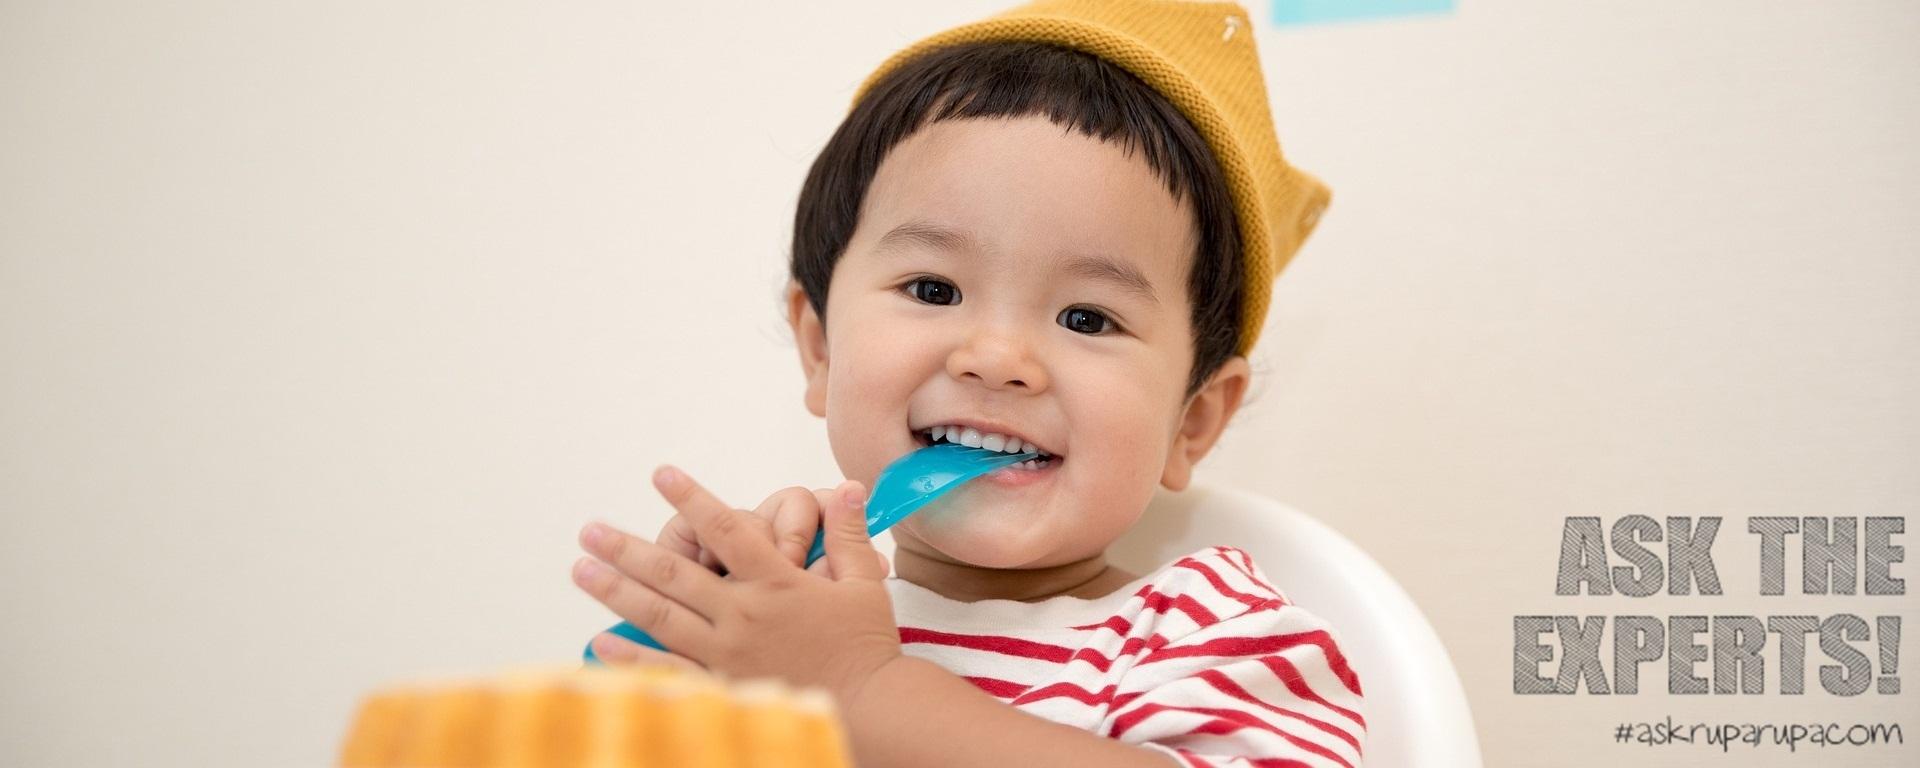 Contoh Menu Makanan Harian Anak Usia 1 3 Tahun Blog Ruparupa